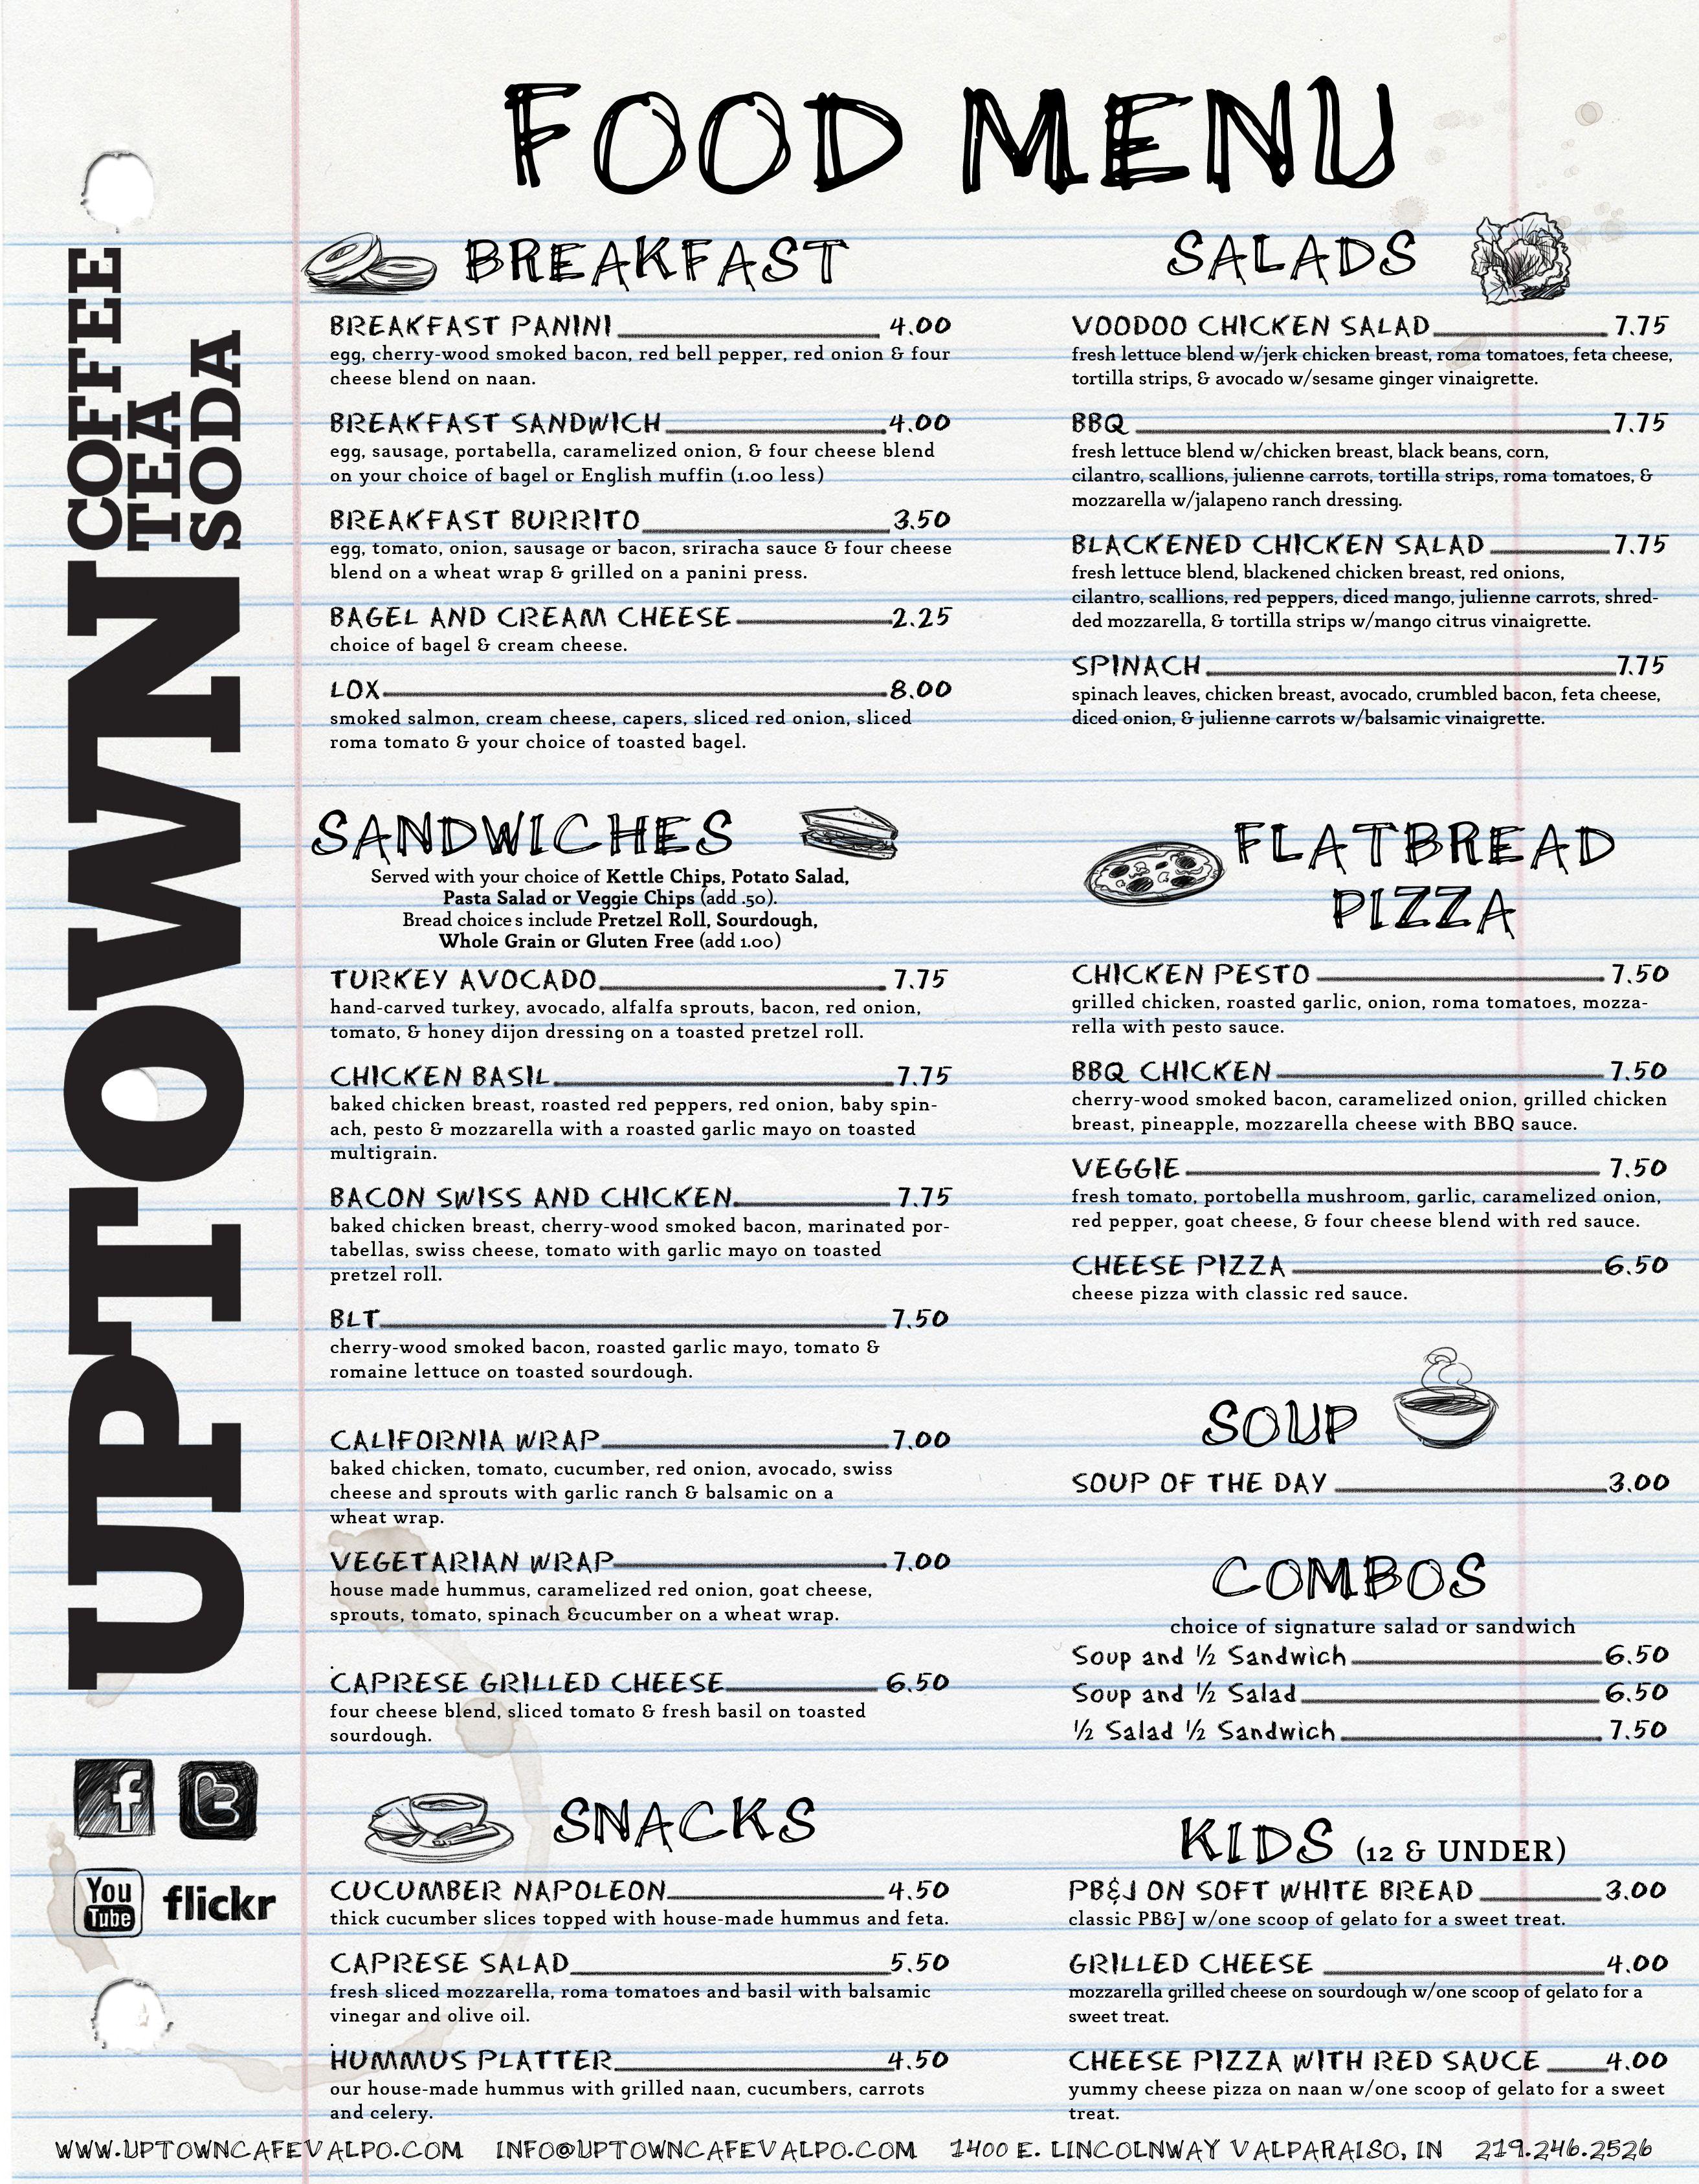 restaurant menu design style free food menu creator software